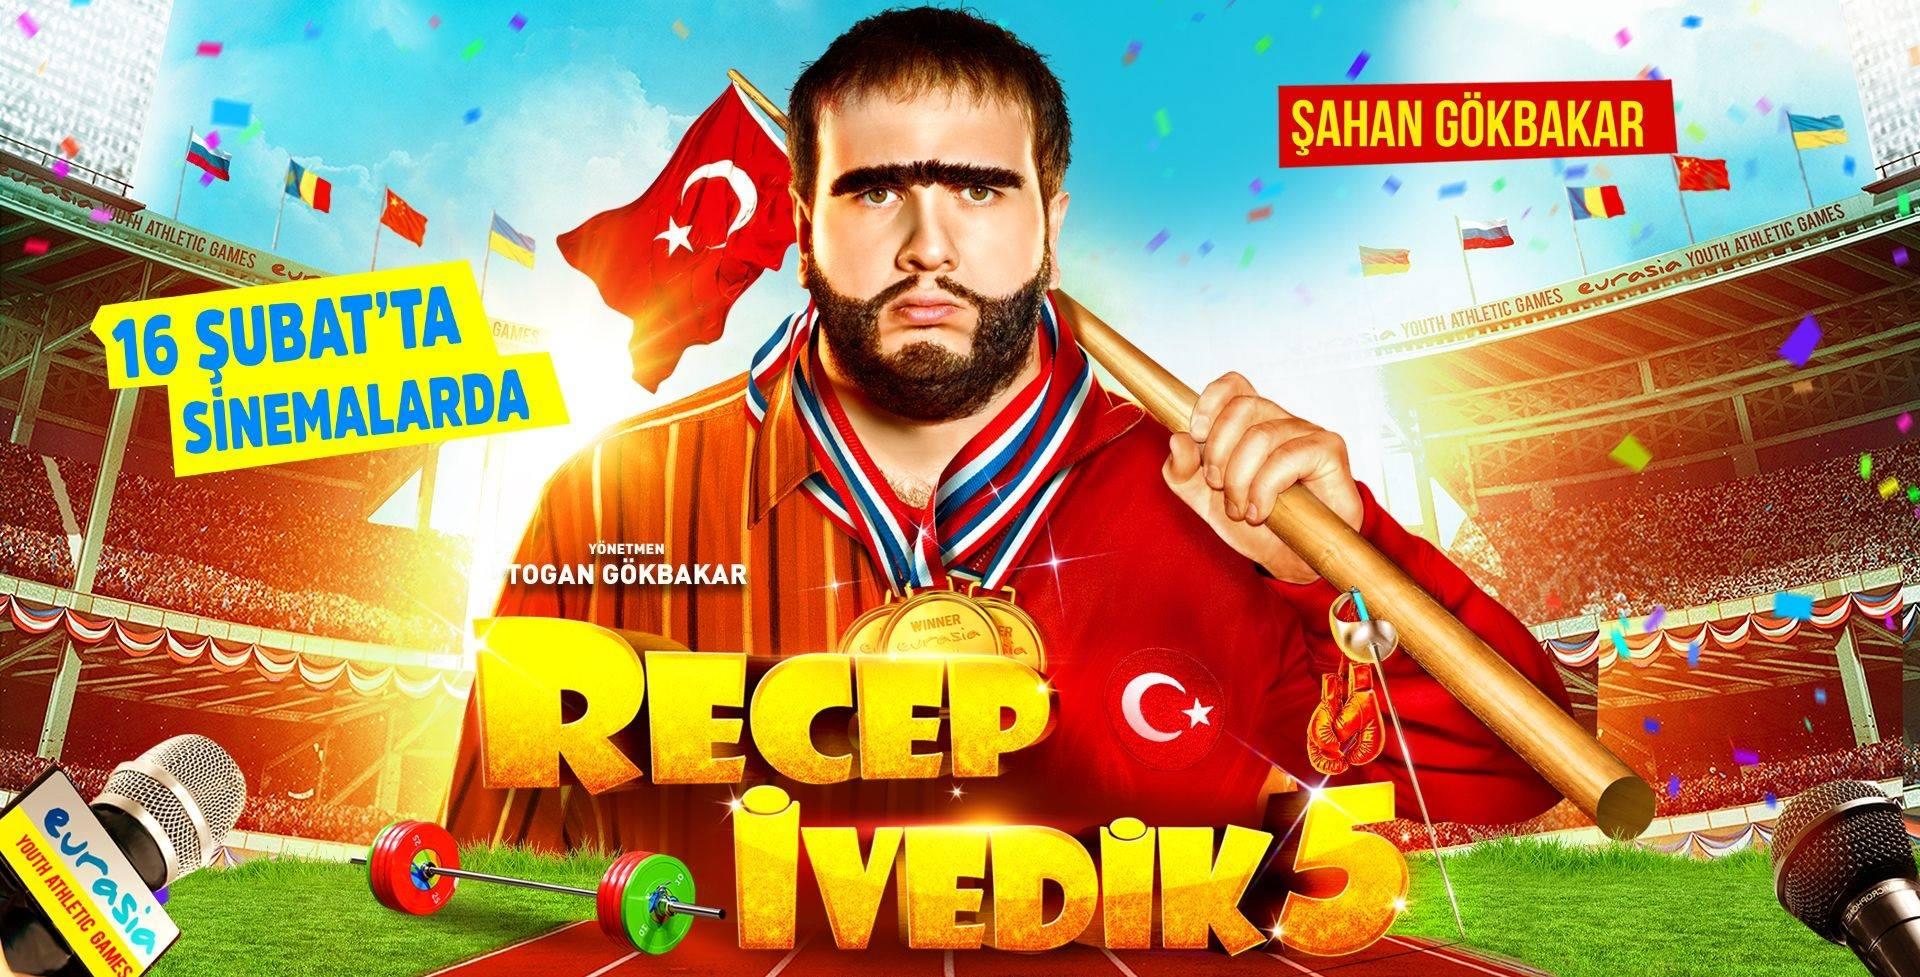 Recep Ivedik 5 (2017)